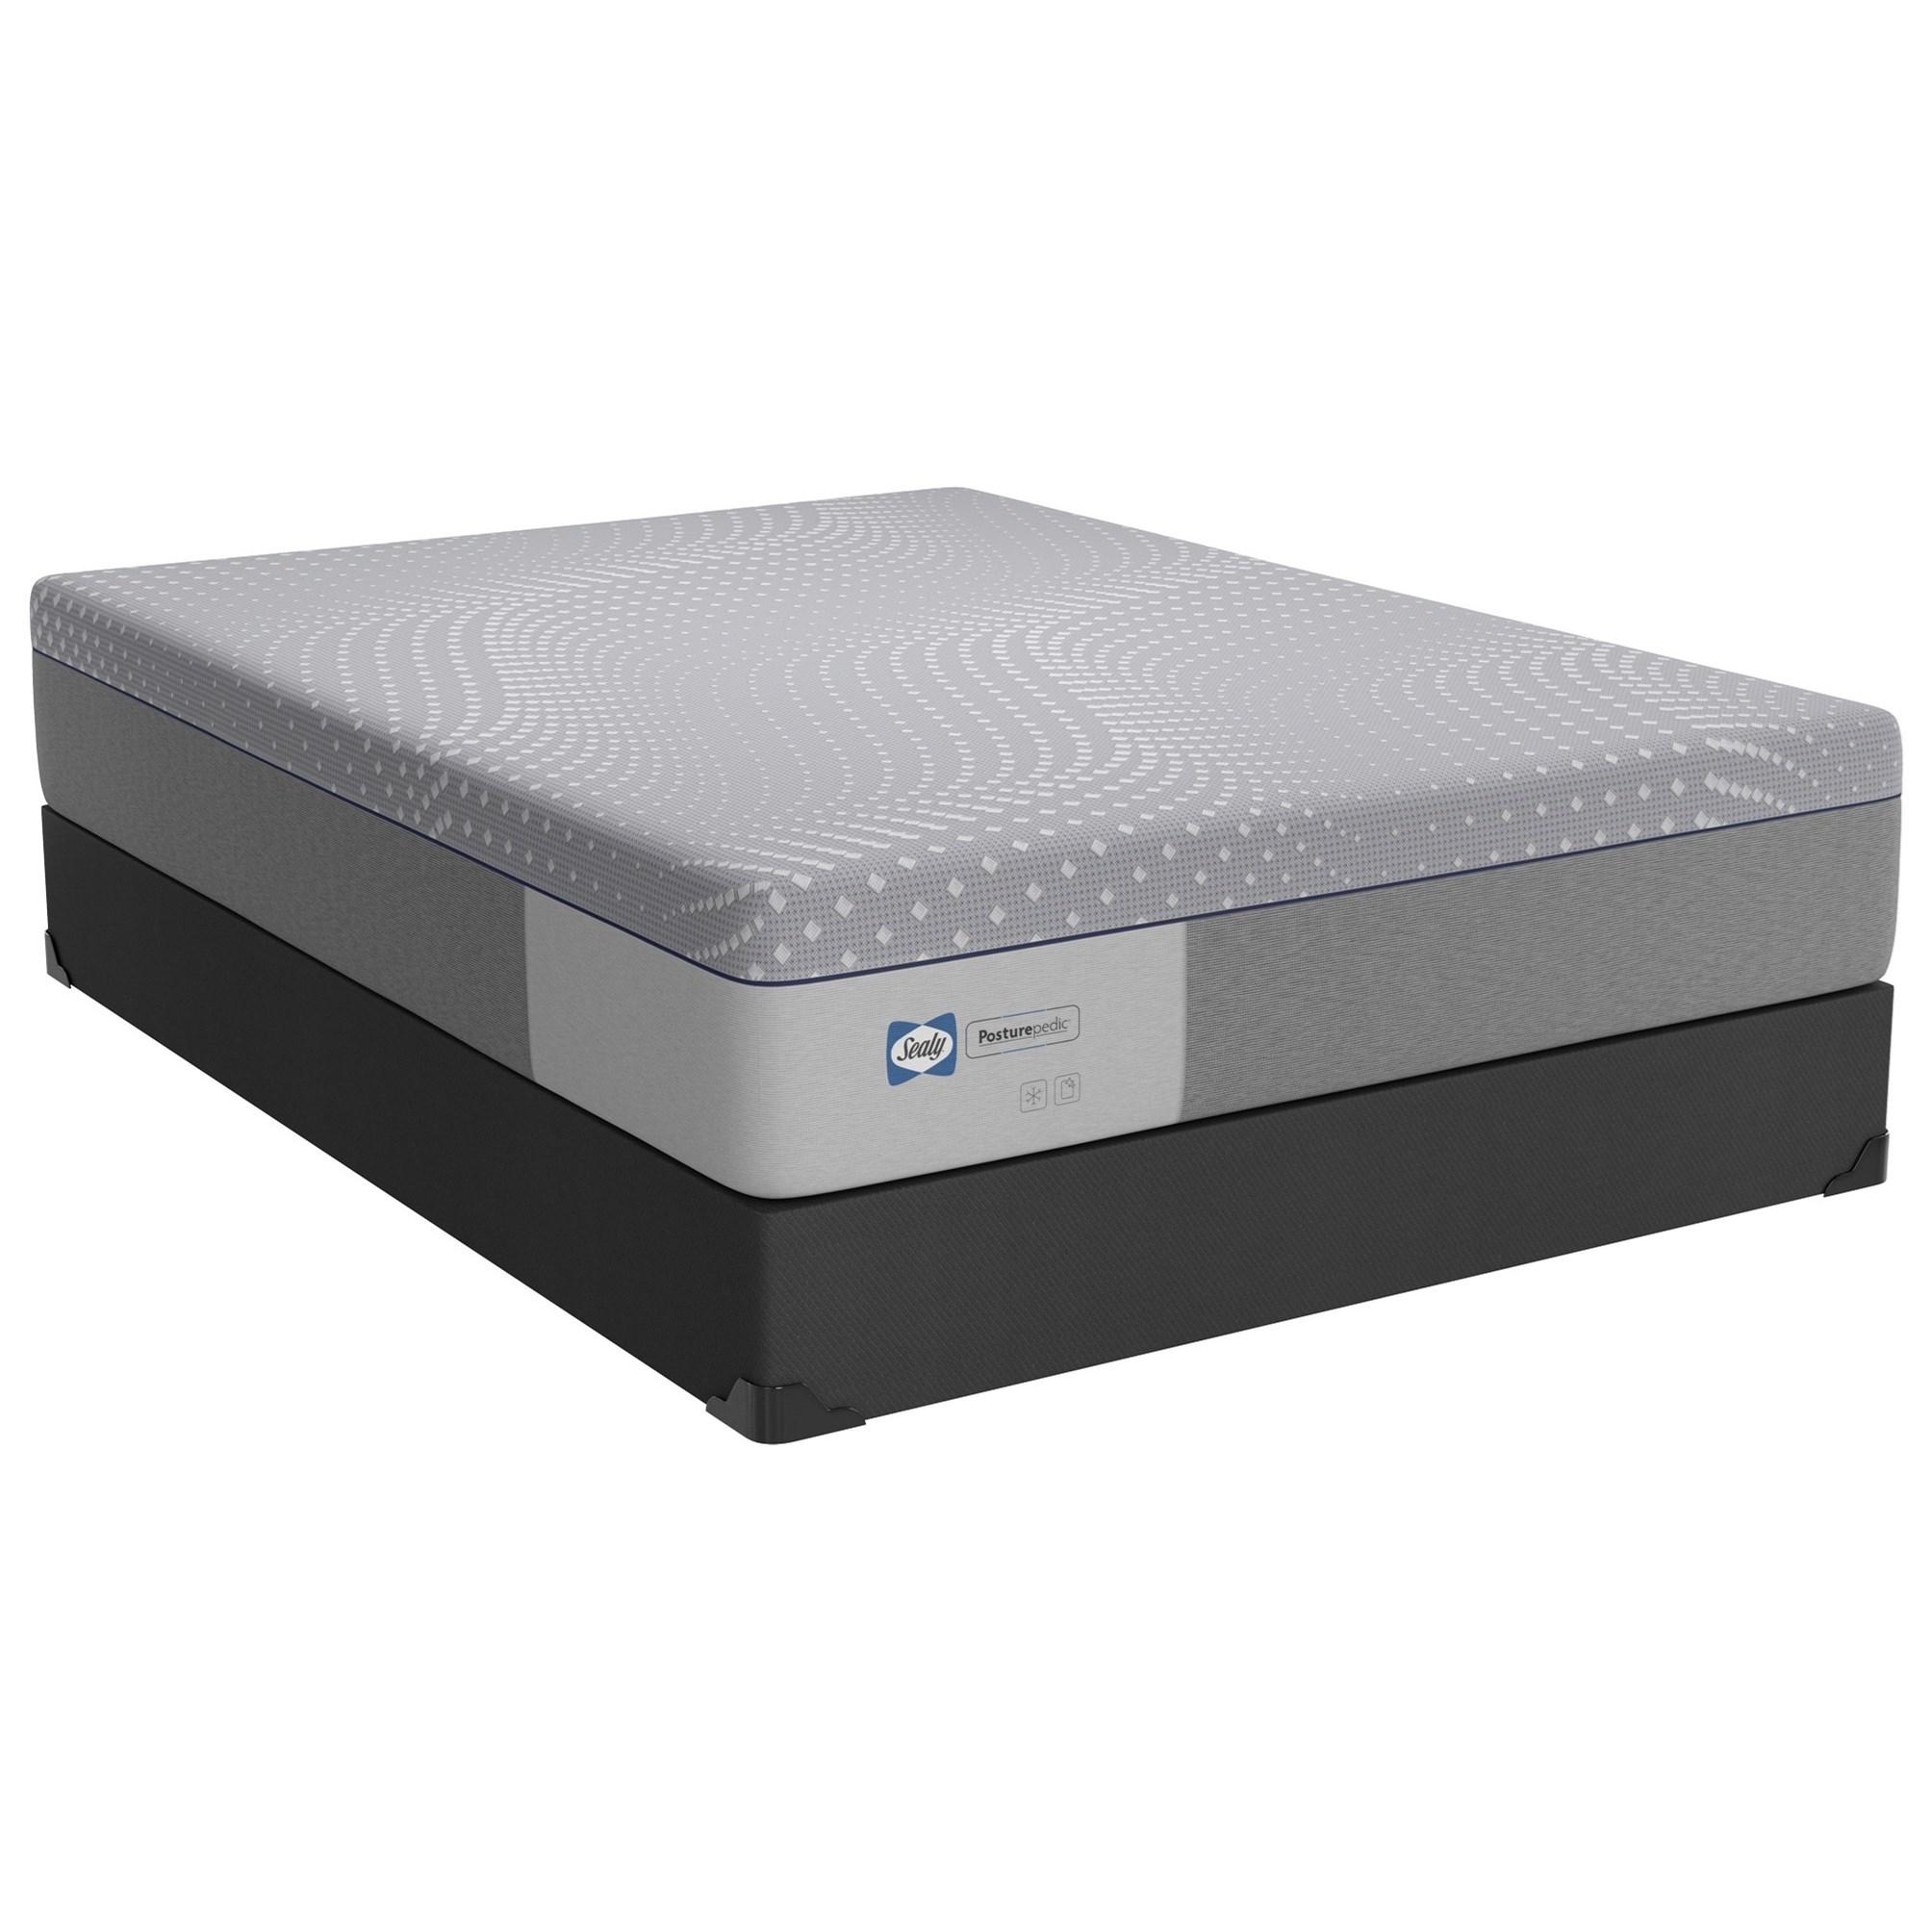 "PPF5 Posturpedic Foam Soft Full 13"" Soft Gel Memory Foam LP Set by Sealy at Sprintz Furniture"